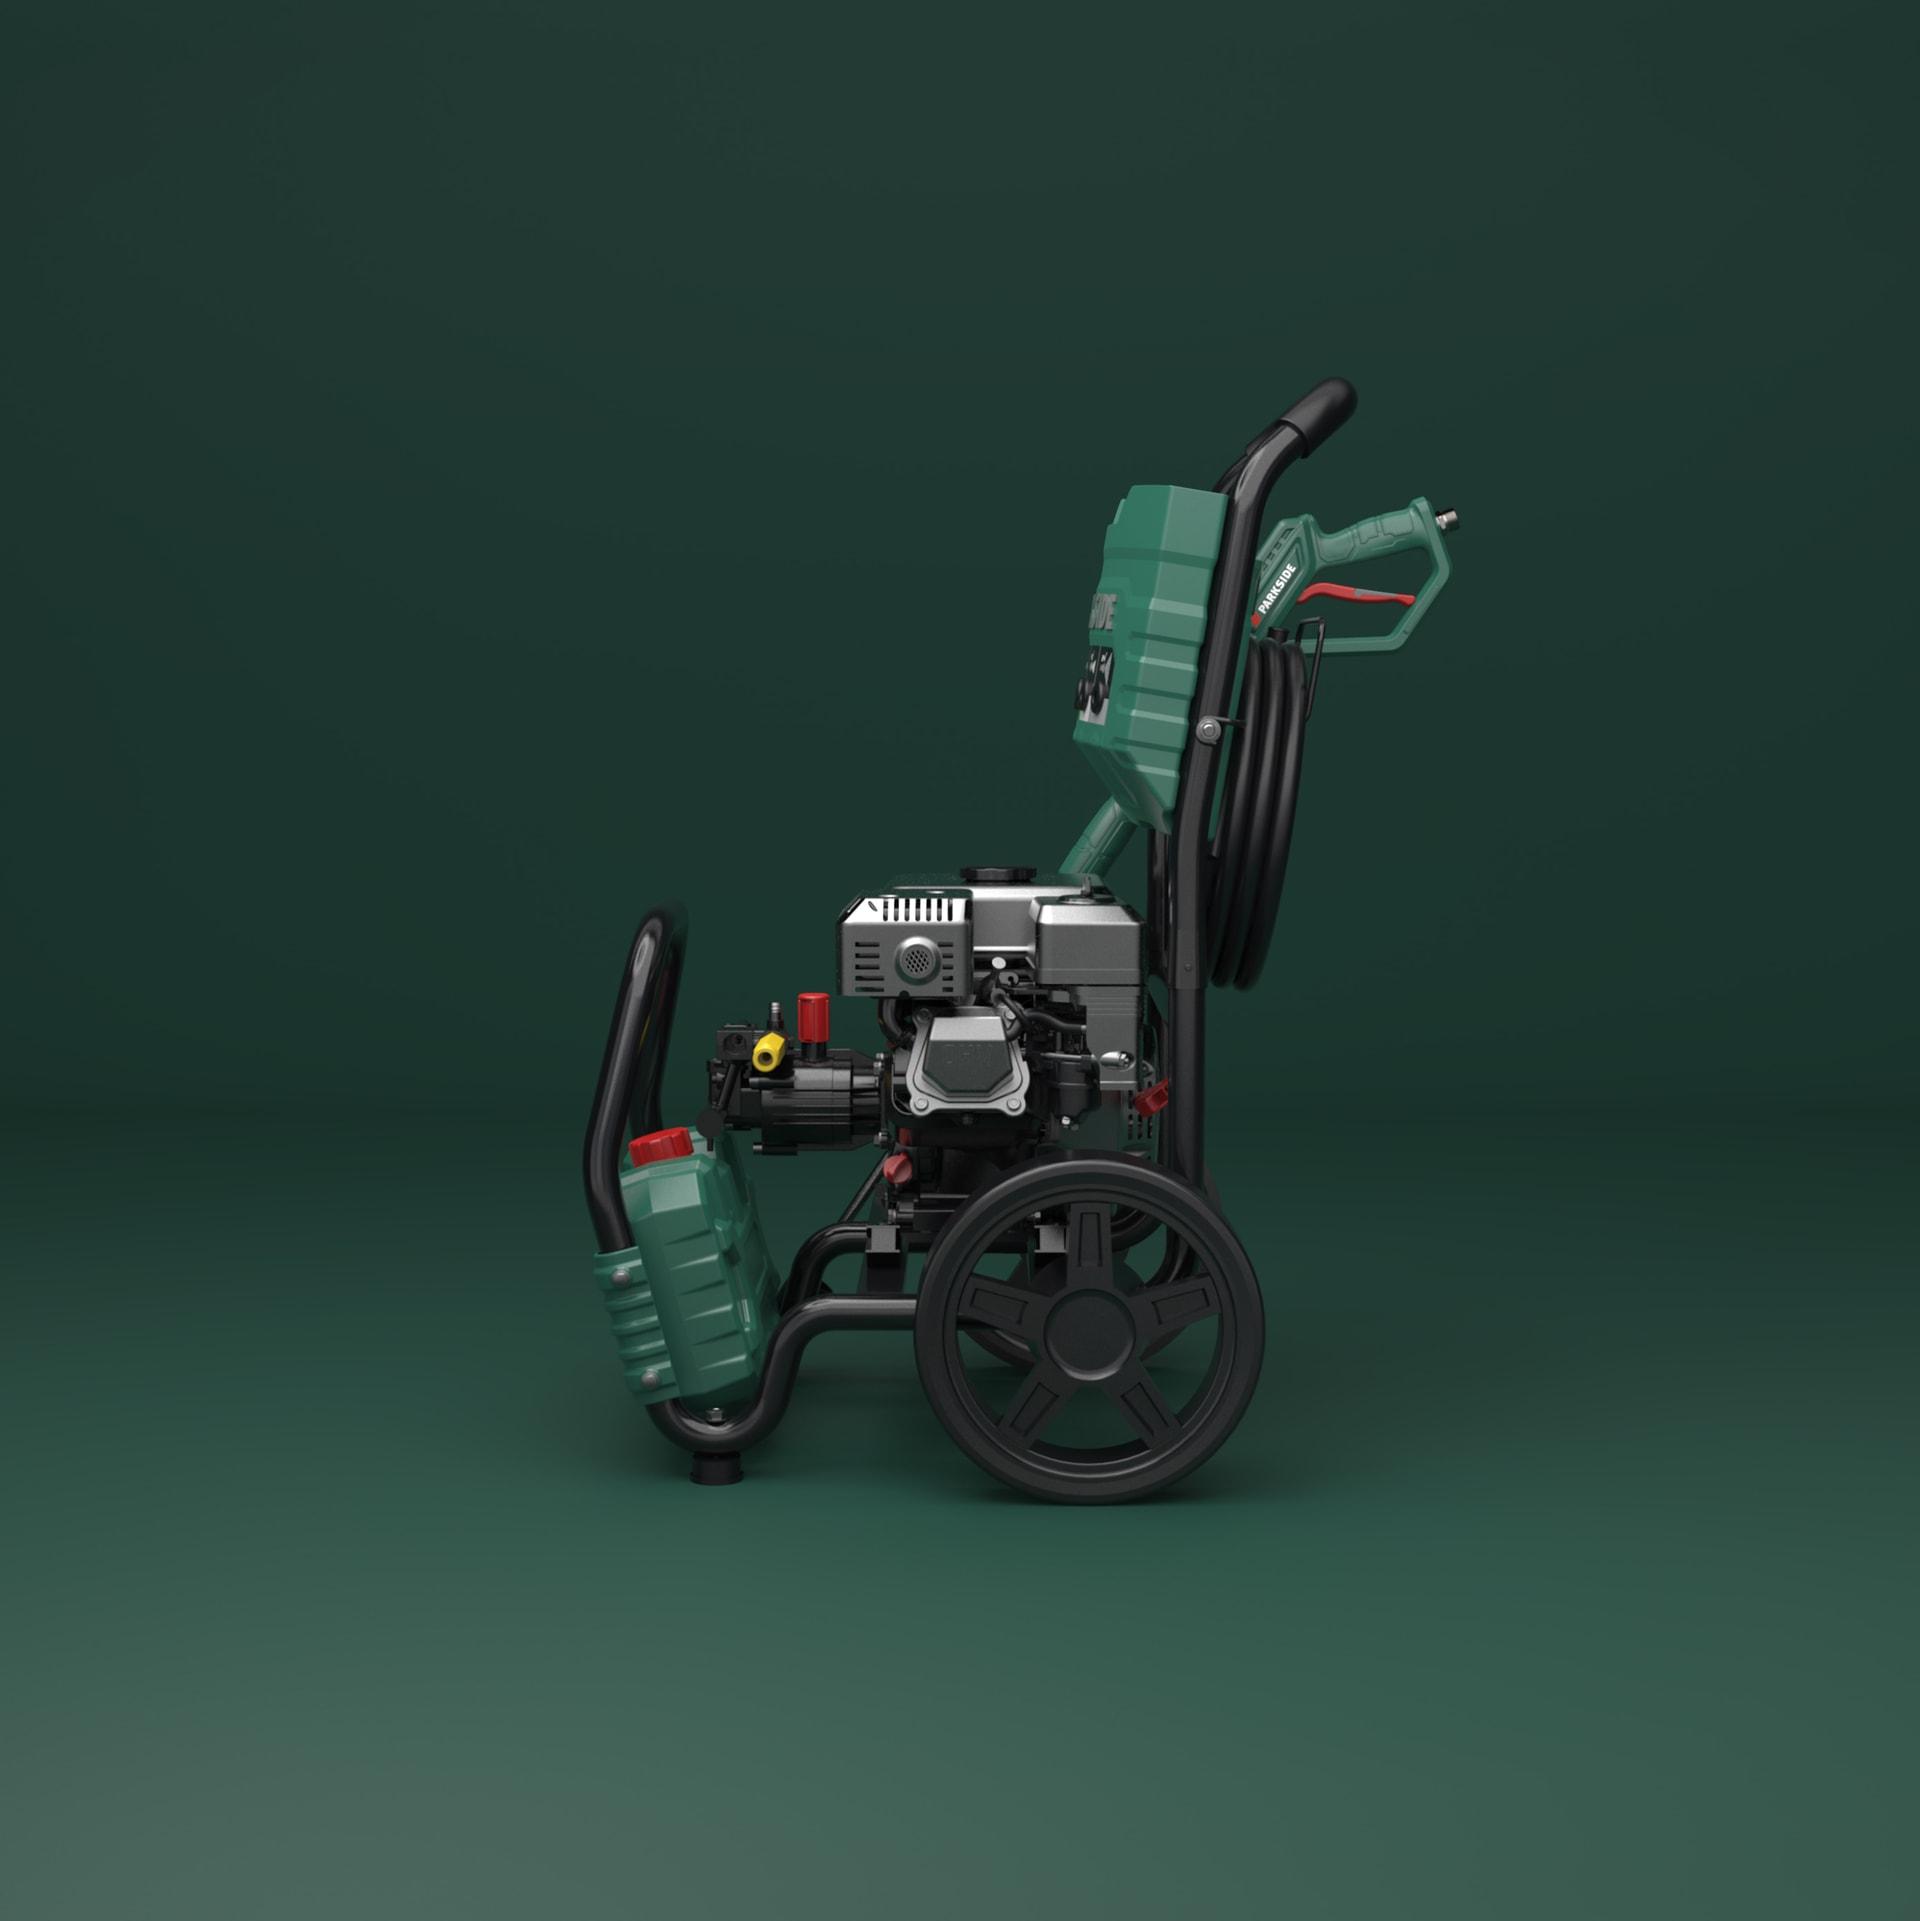 parkside_petrol_pressure_washer_industrialdesign_right